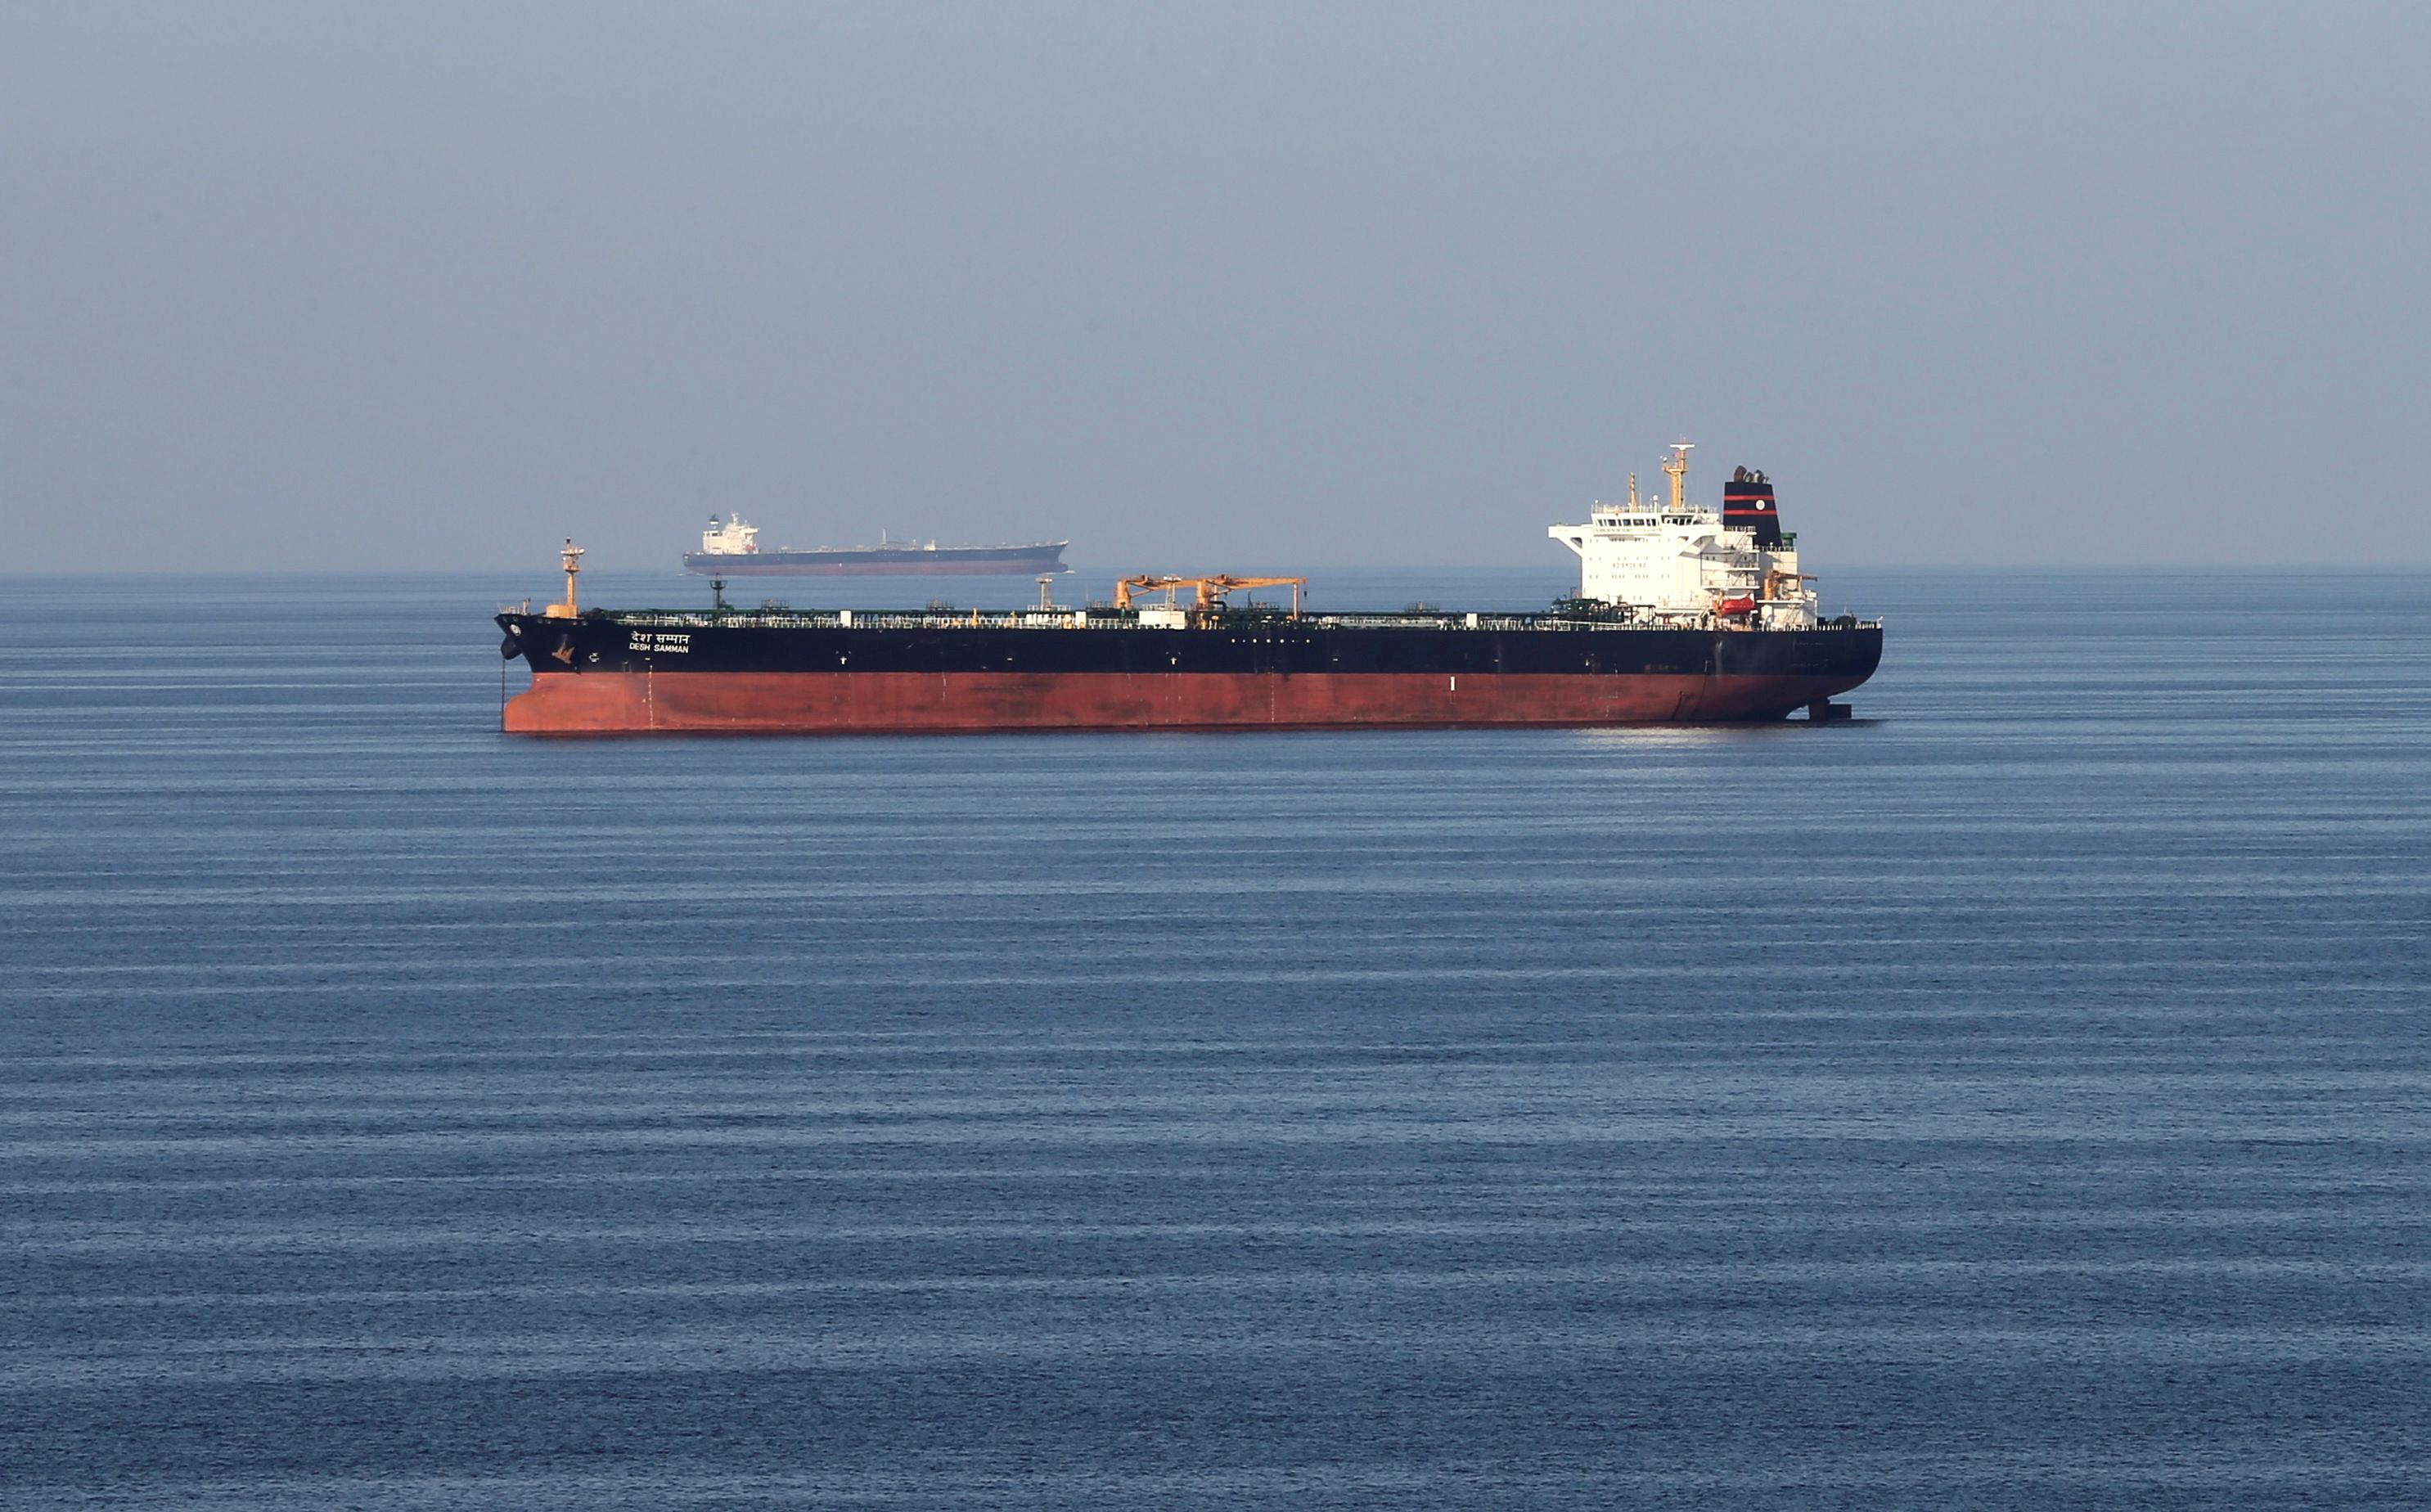 Two oil tankers in the ocean.